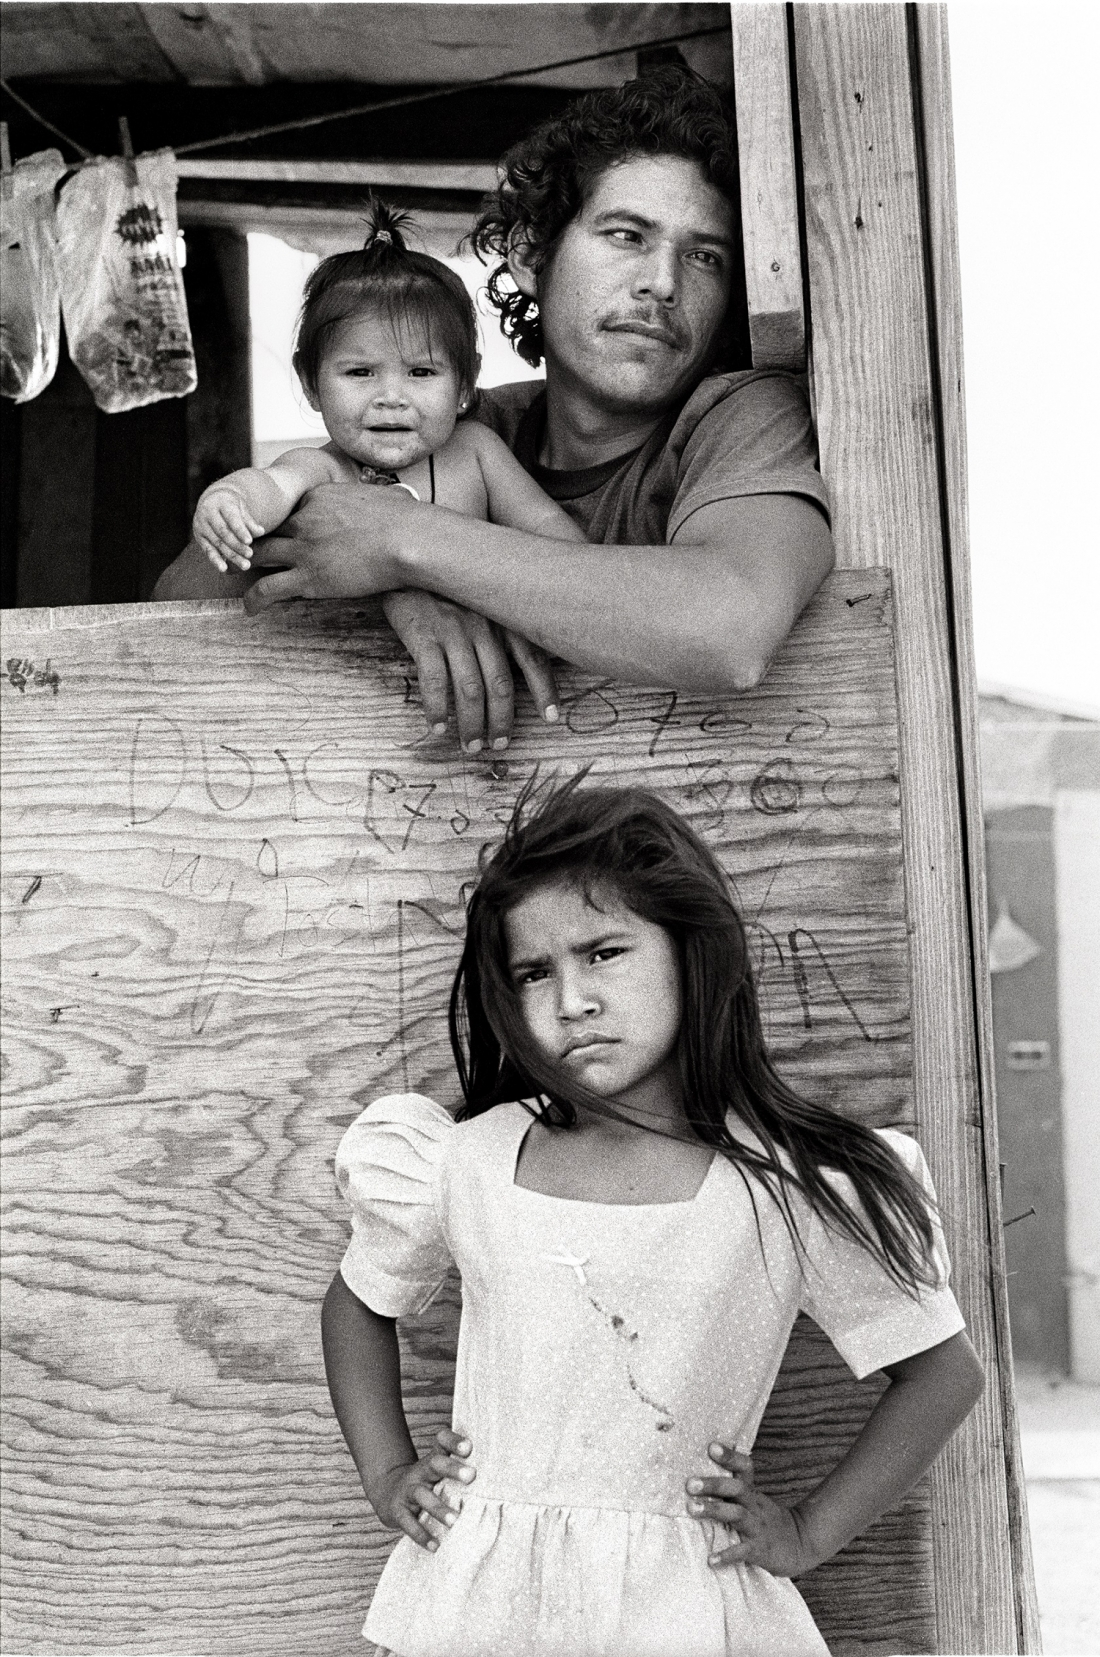 Laura Wilson, Child with Father and Sister, Colonia, Nuevo Laredo Mexico, April 19, 1993